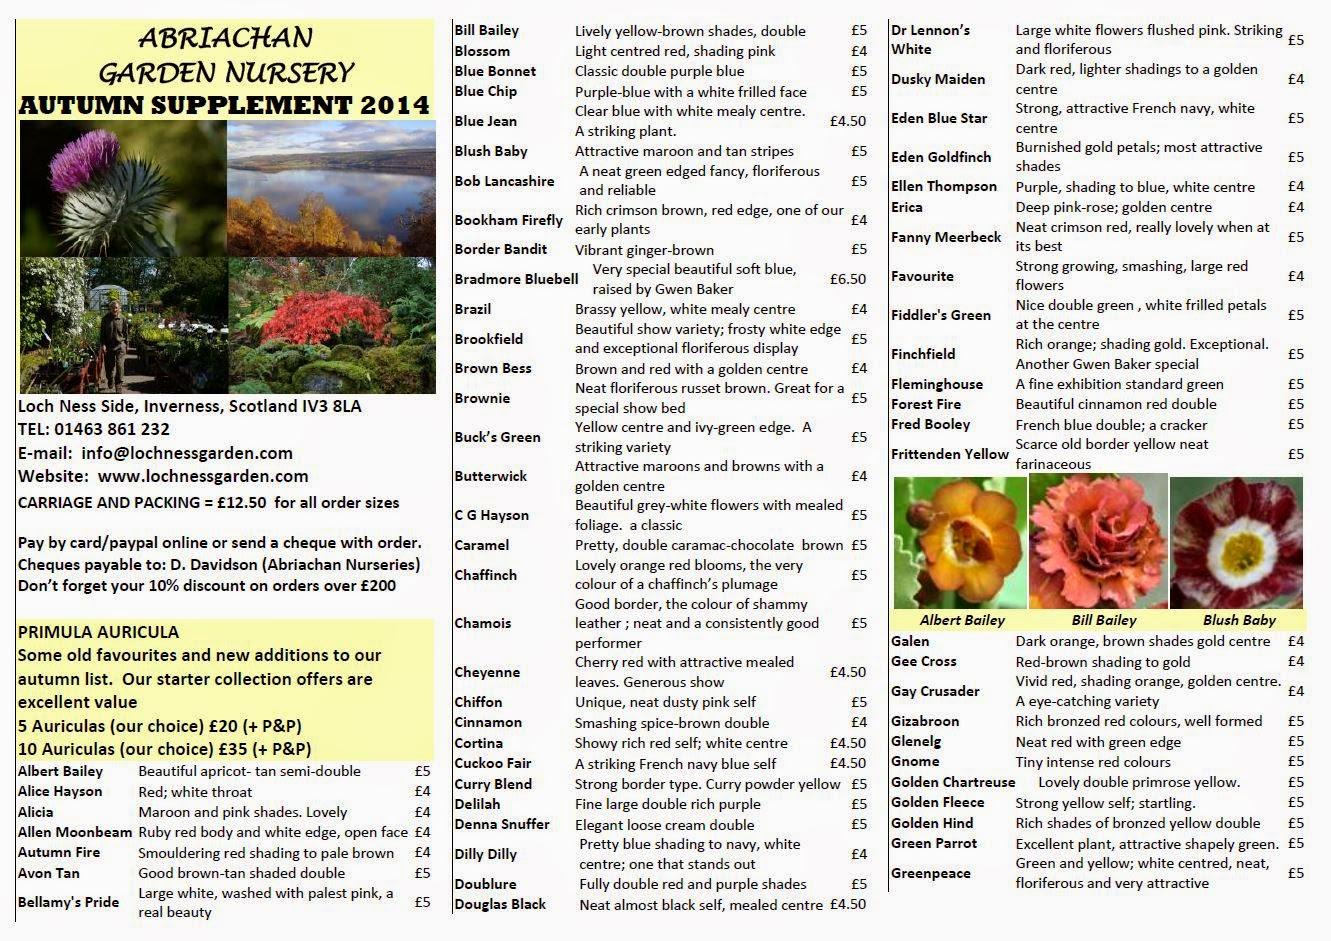 http://www.lochnessgarden.com/catalogue/htmcatalogue/Autumn%20Supp%202014.htm